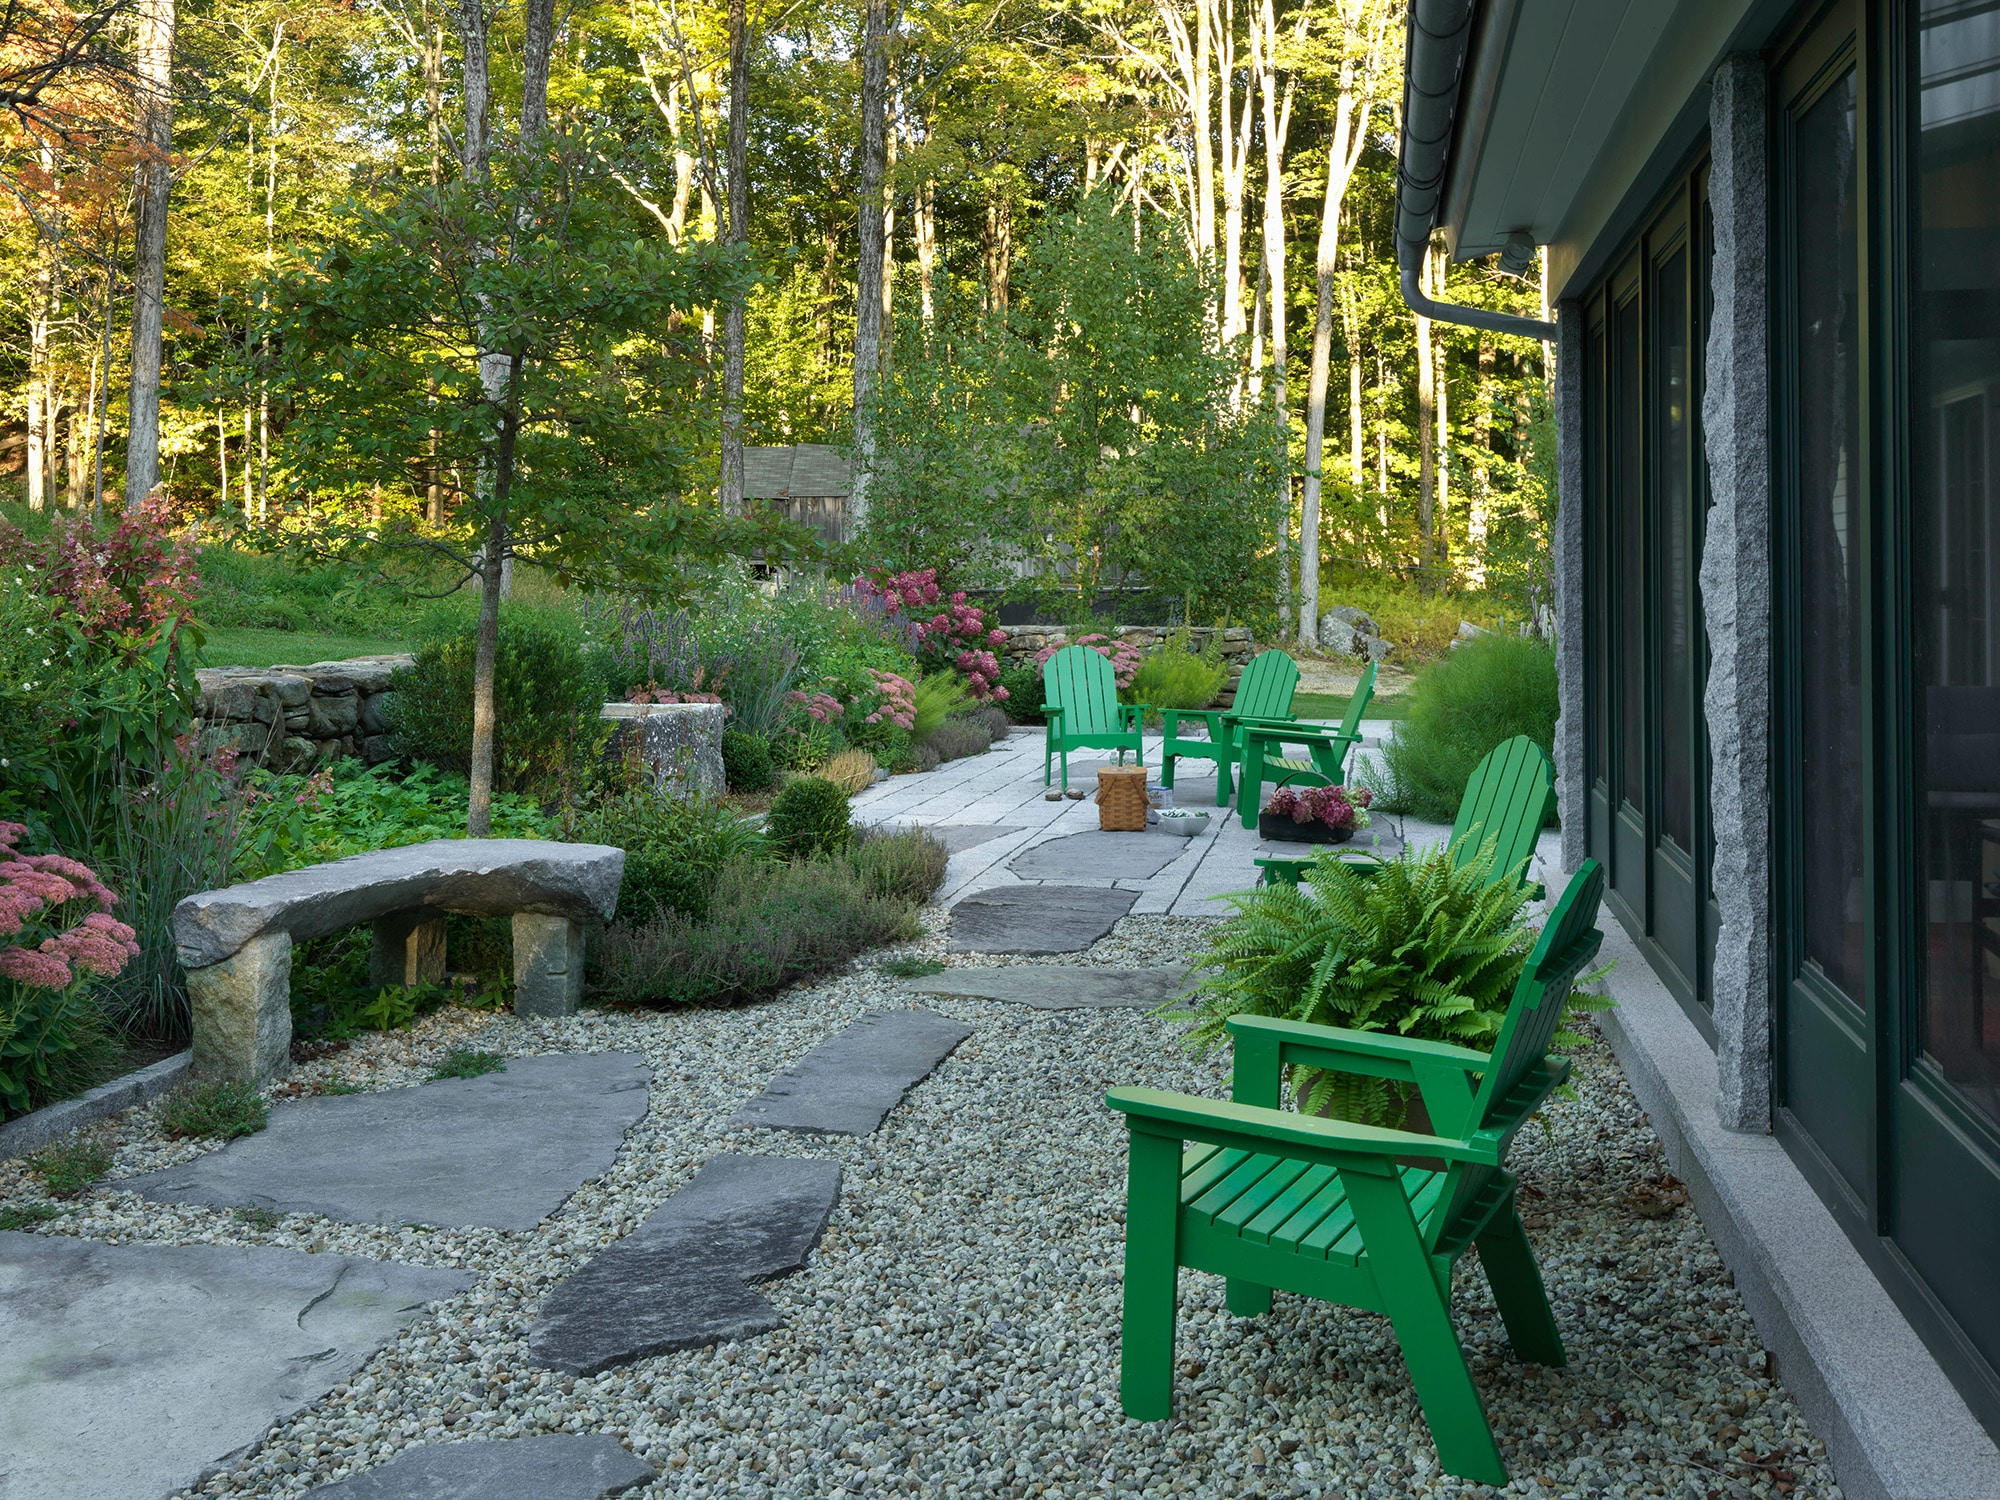 JMMDS Residential Landscape Design: Monadnock Region, New Hampshire